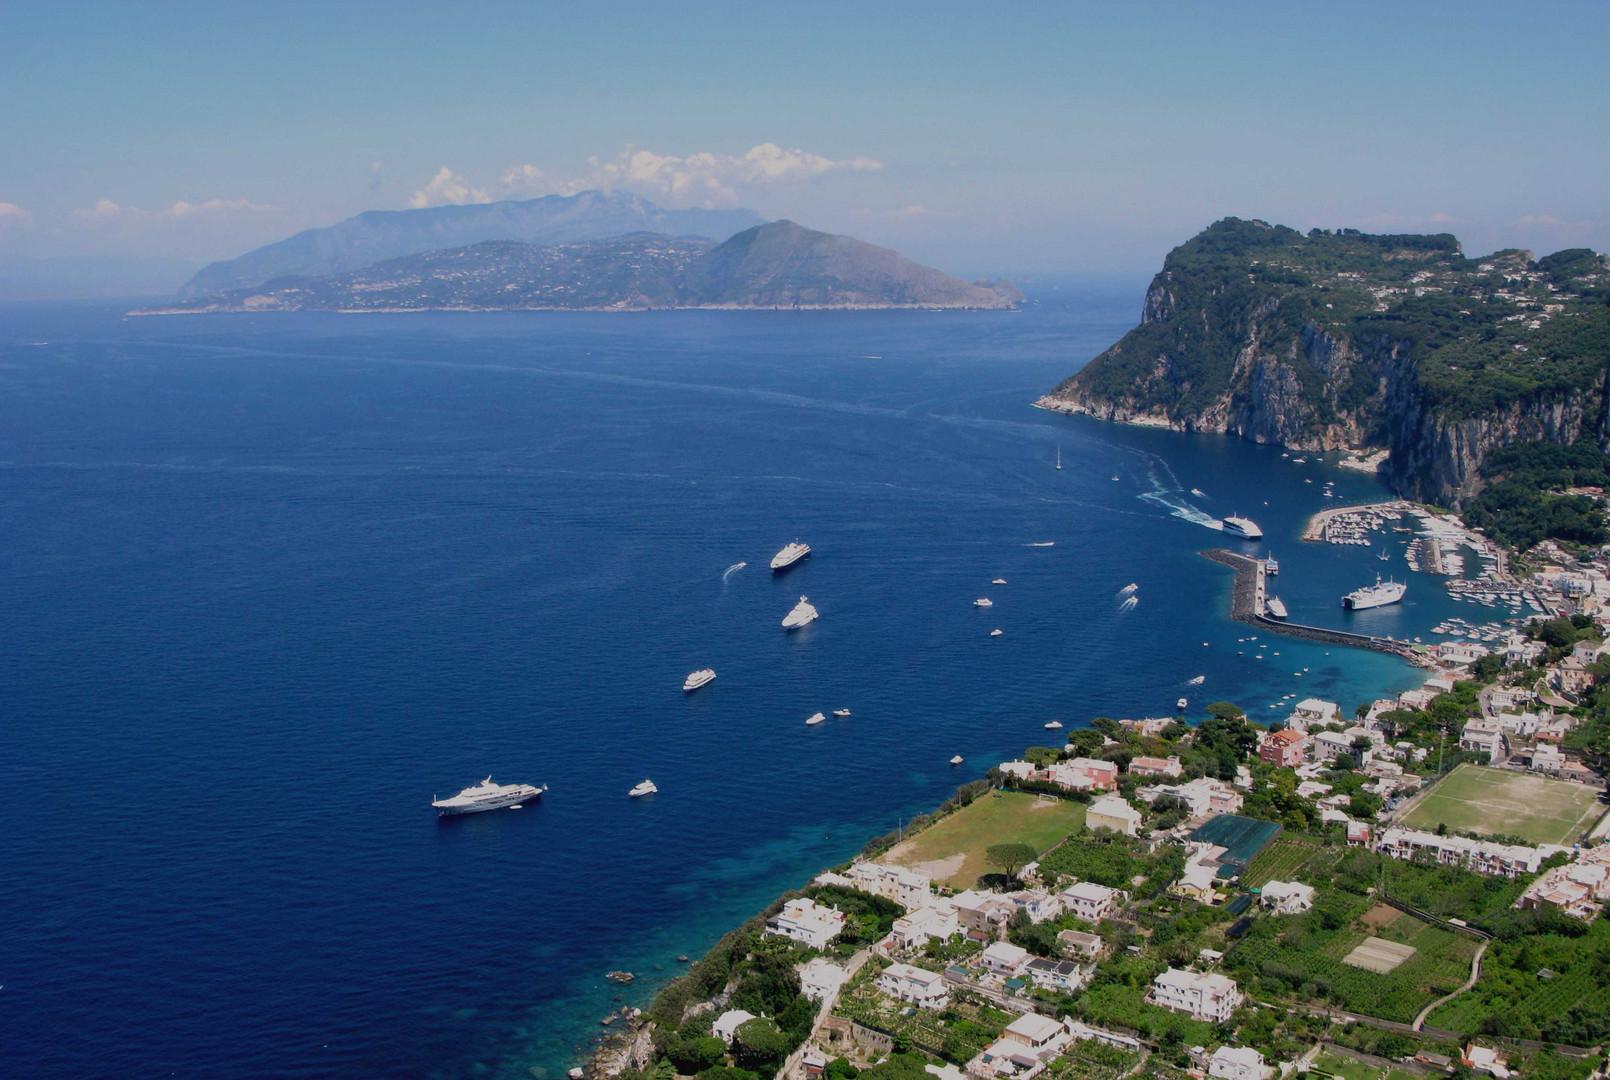 Vista desde Anacapri - Italia